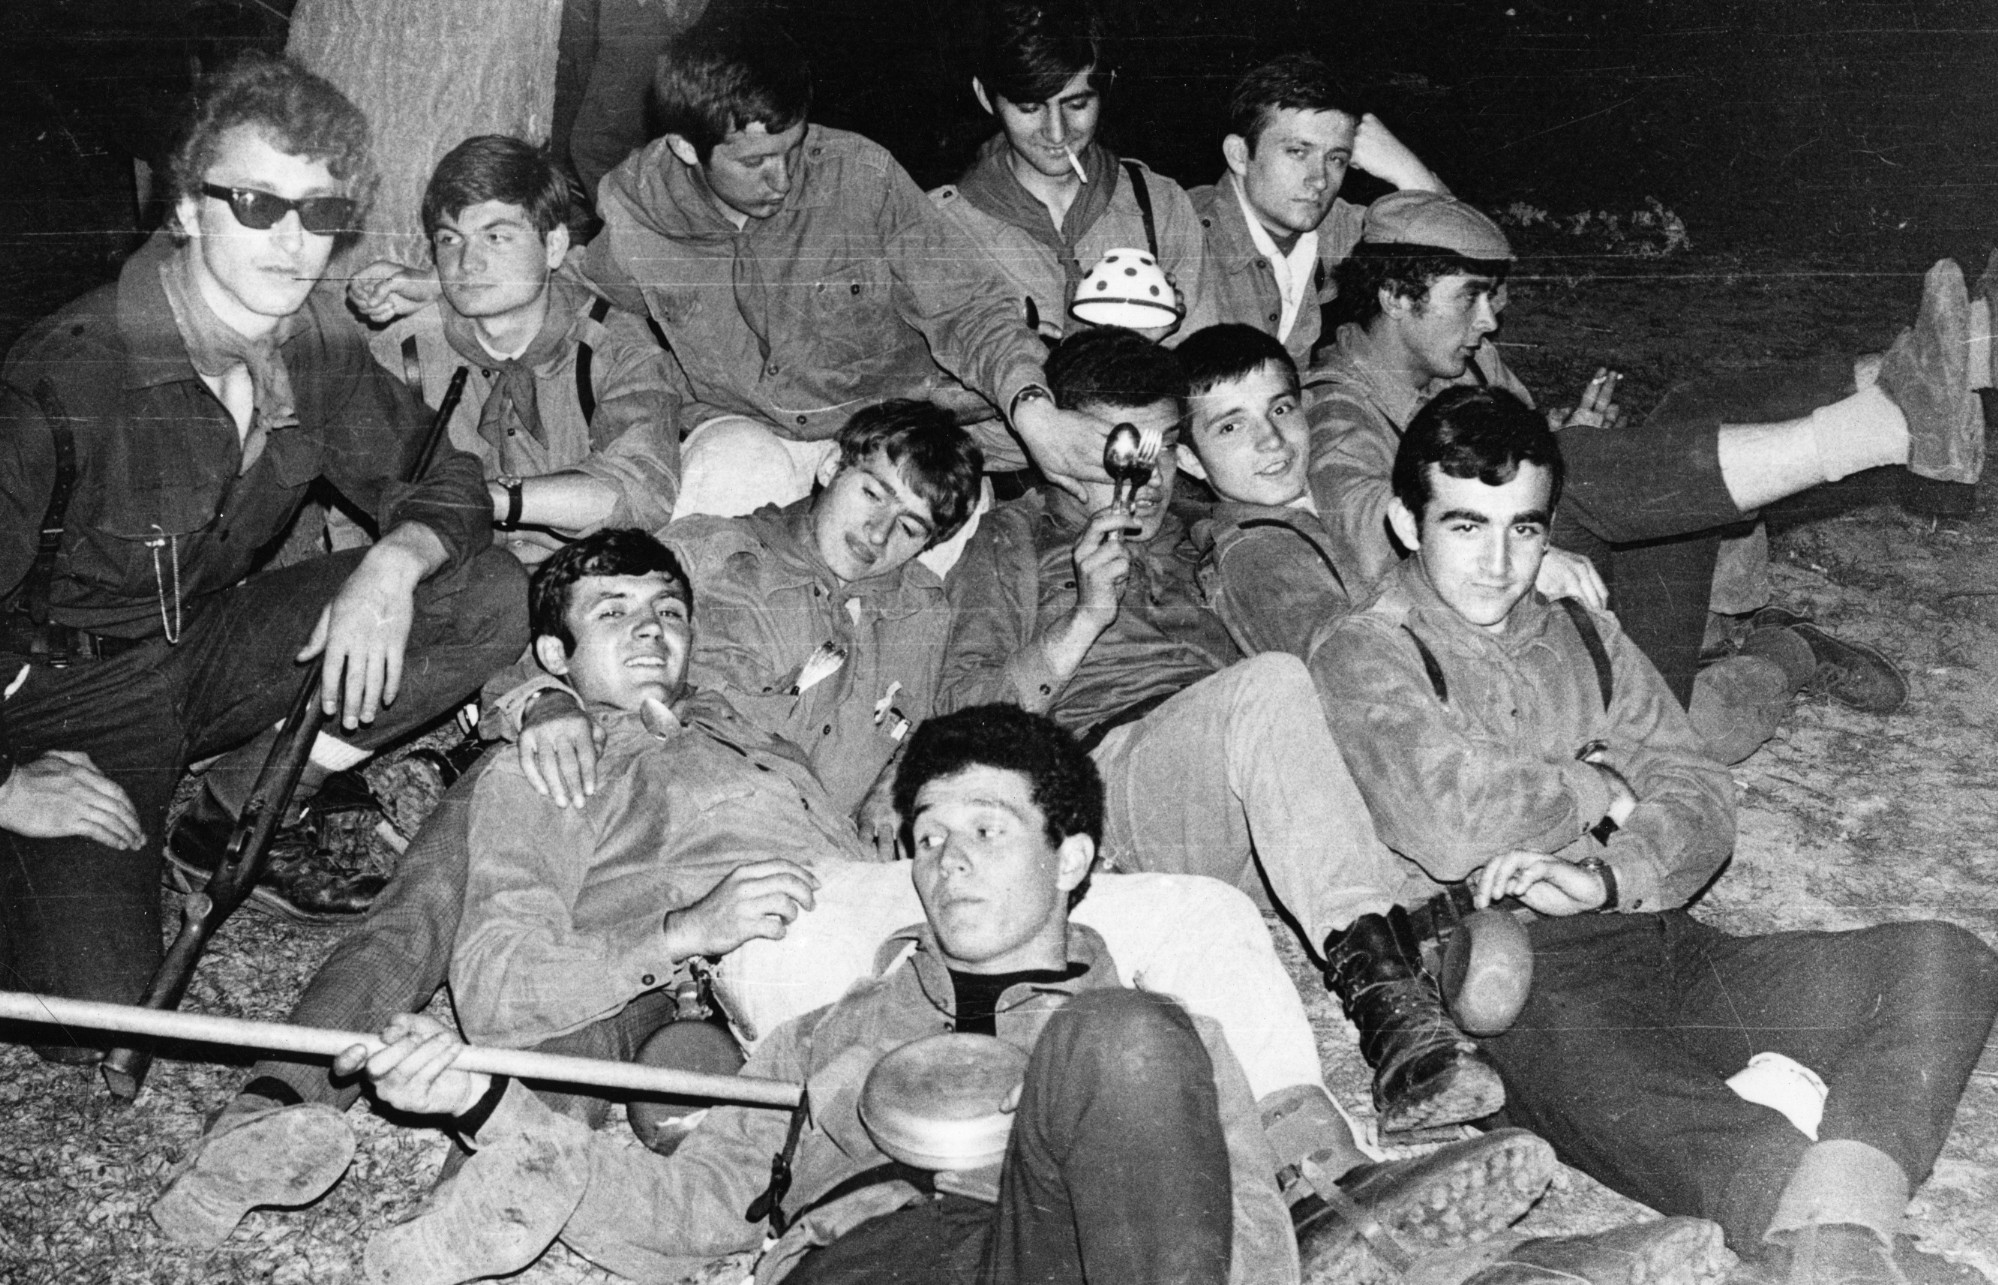 Sa speleolozima na maršu, maj 1969.